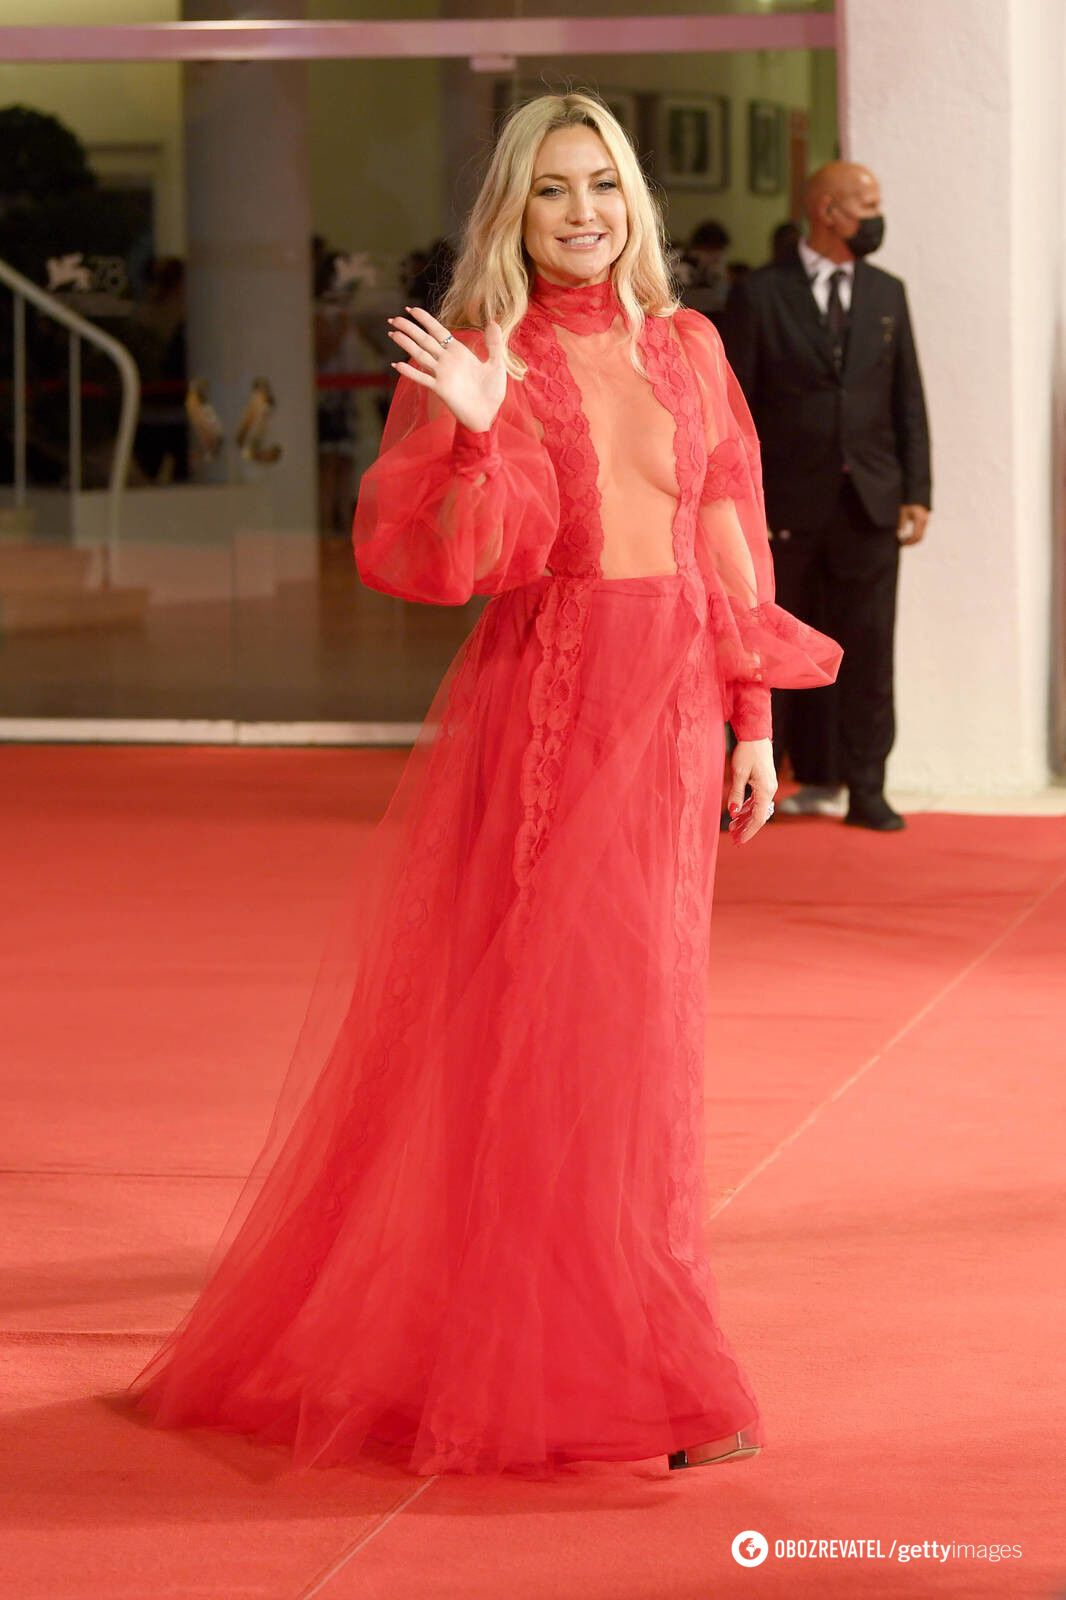 Кейт Хадсон в кутюрном платье от Valentino алого цвета